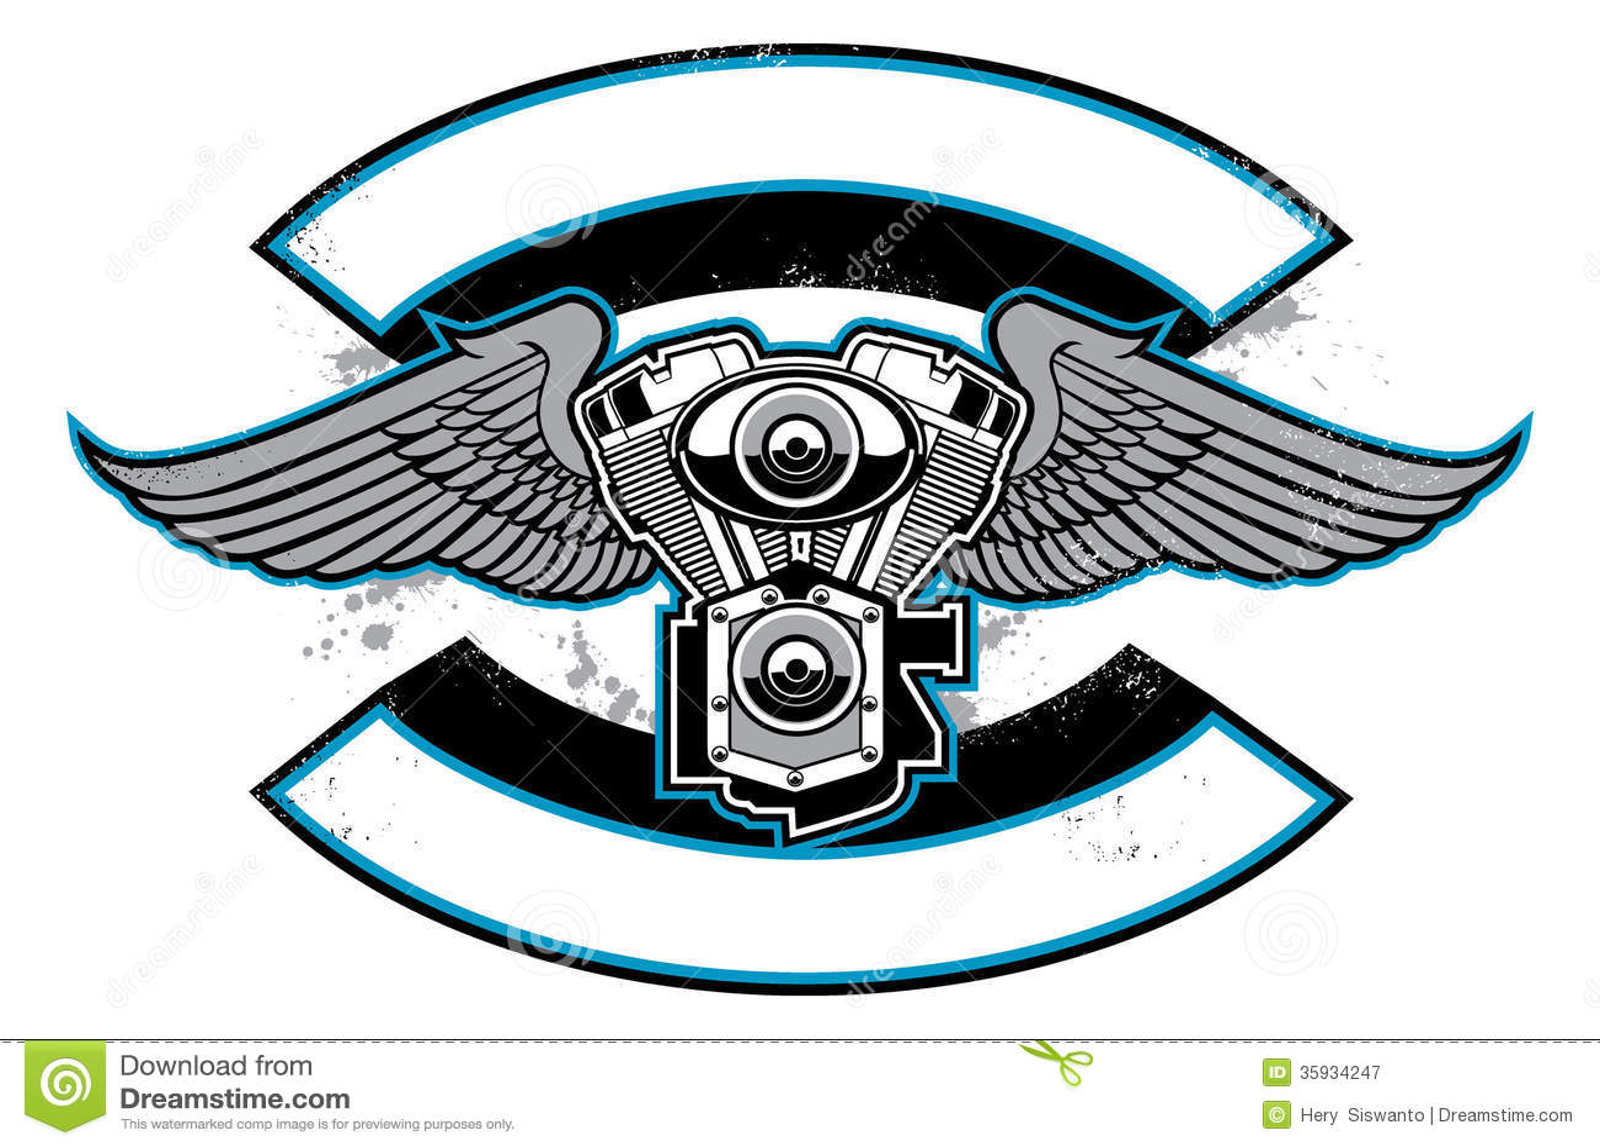 ... wings, suitable as a club logo, team, t-shirt print, sticker etc. all